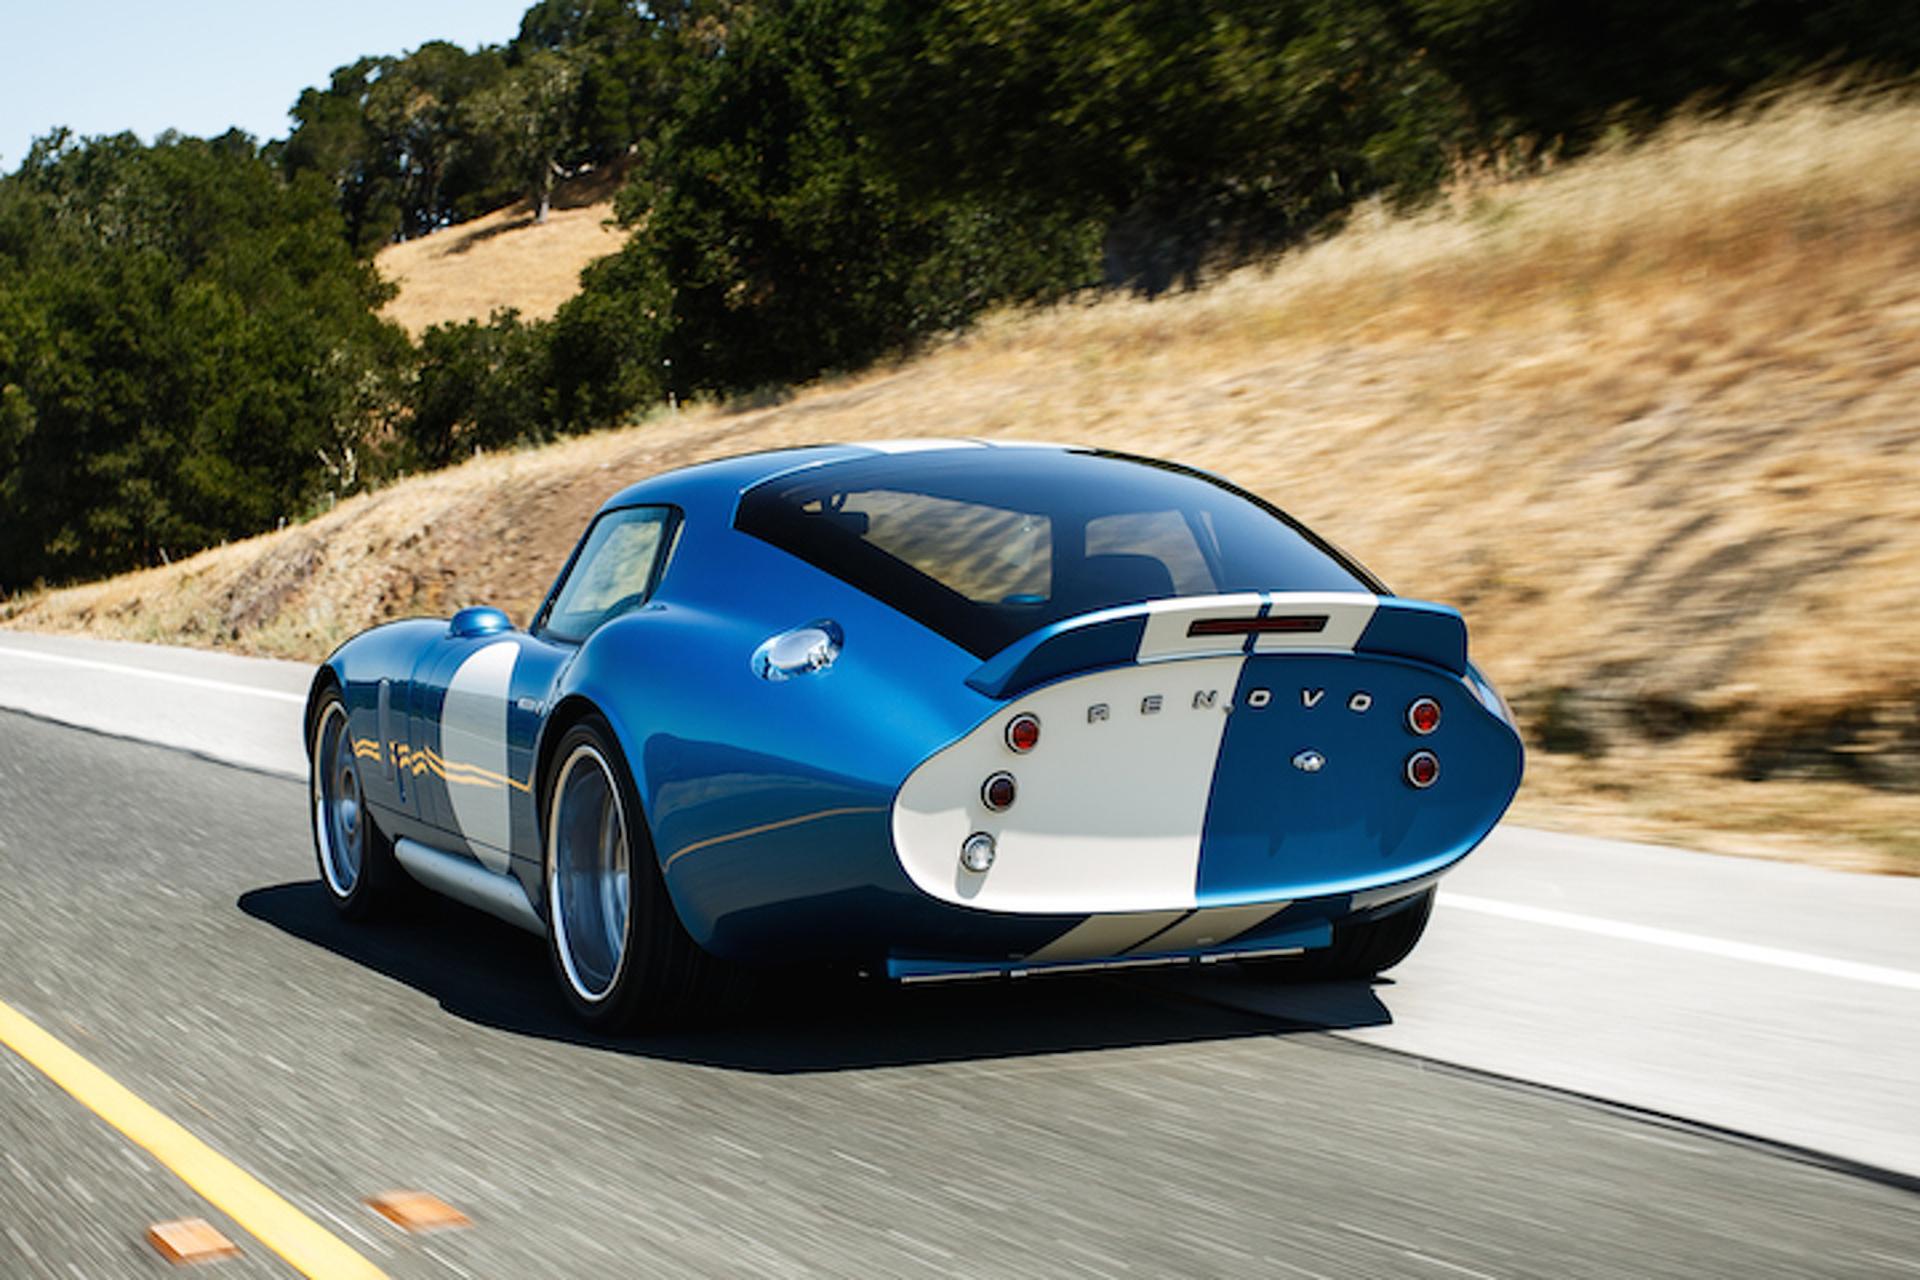 Renovo Coupe Blends EV Technology, Retro Looks: Pebble Beach